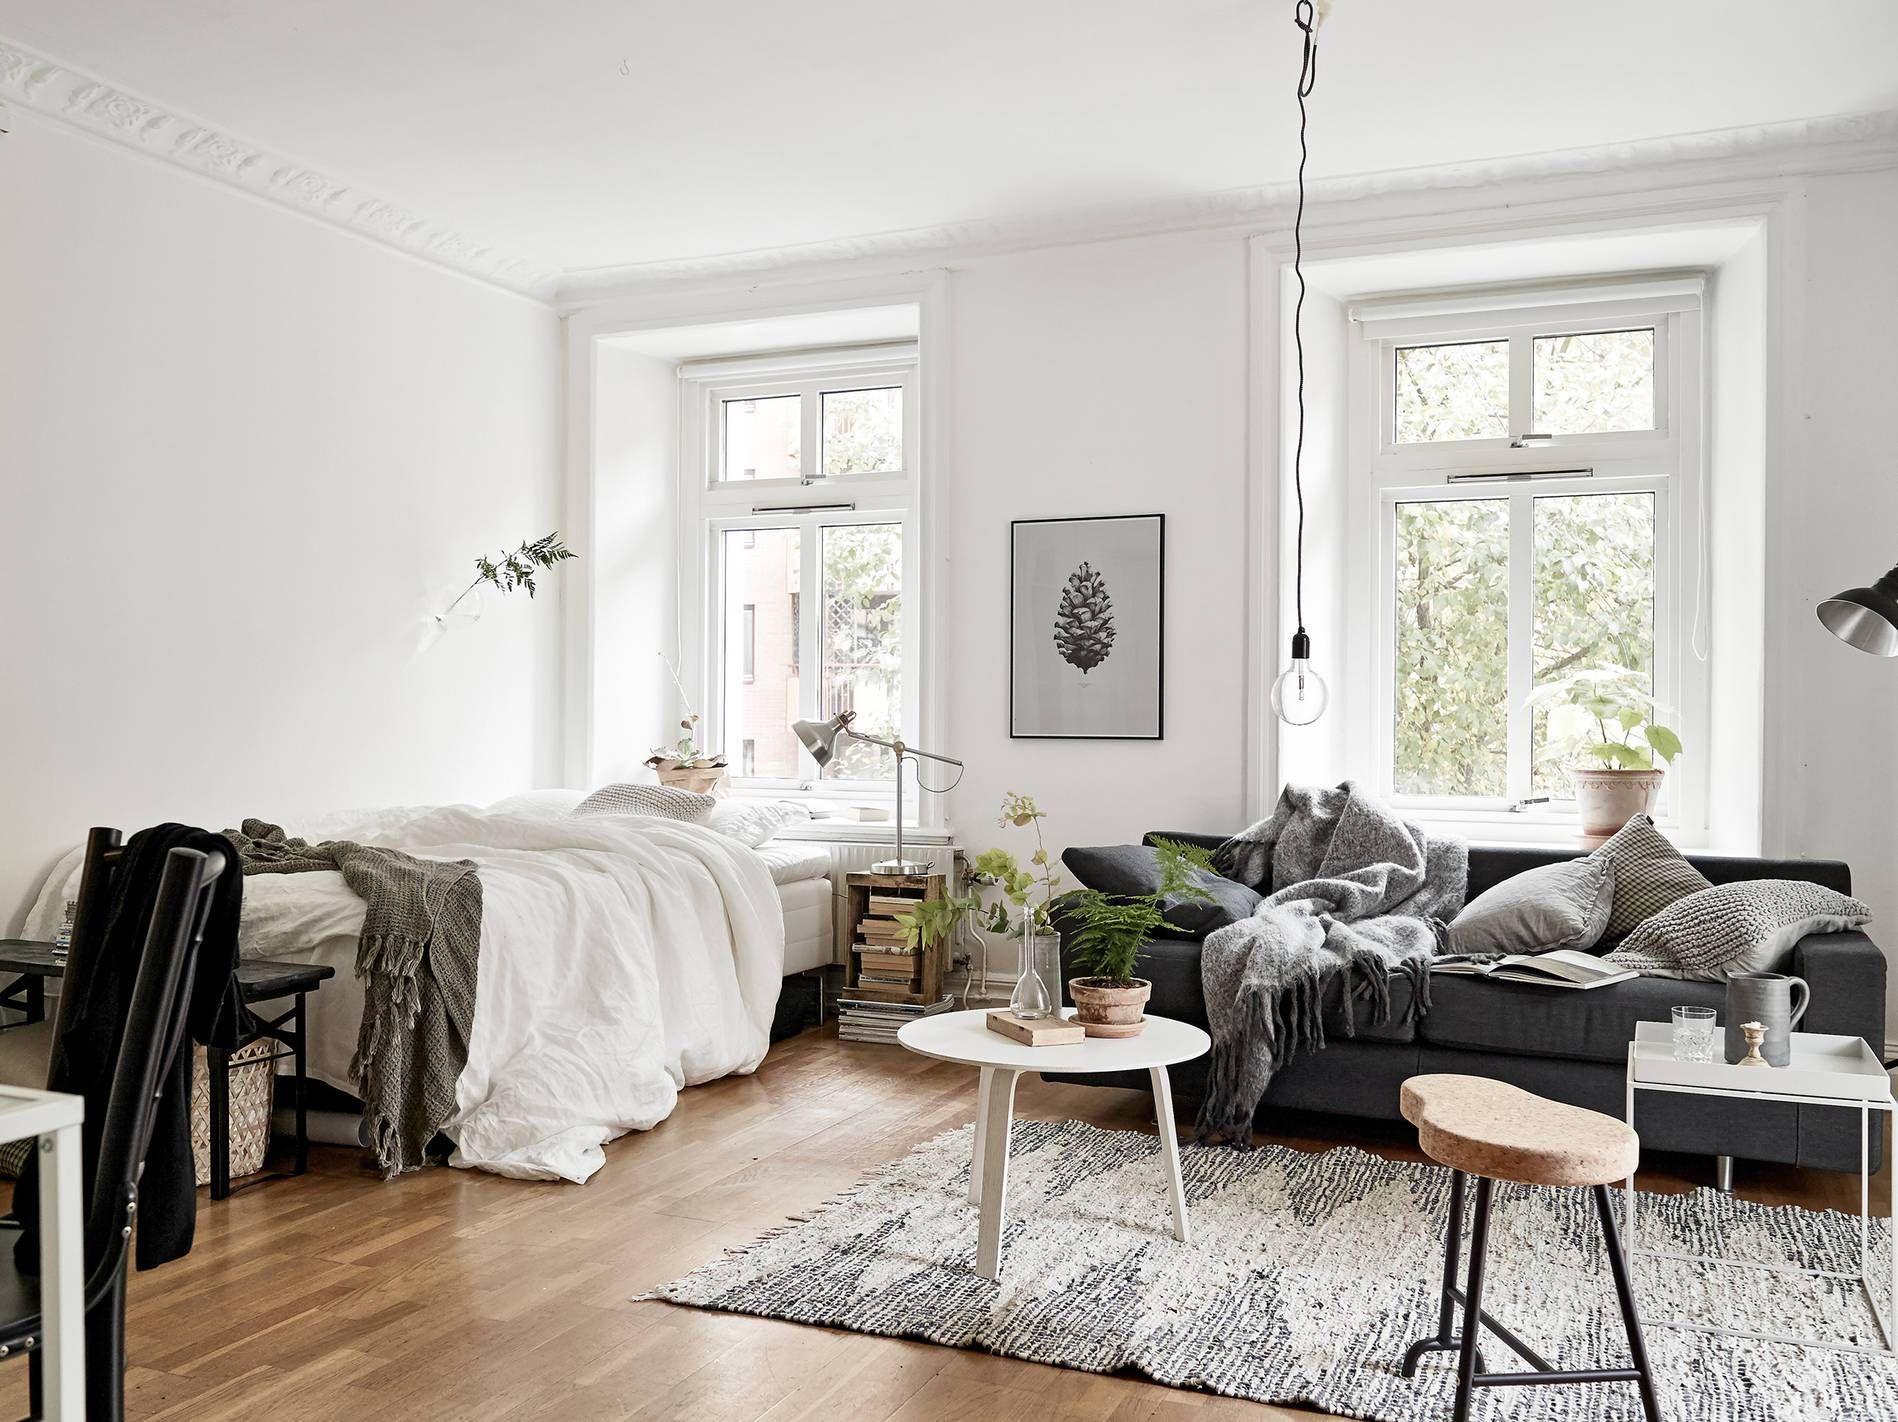 Cozy One Room Flat One Room Flat Studio Apartment